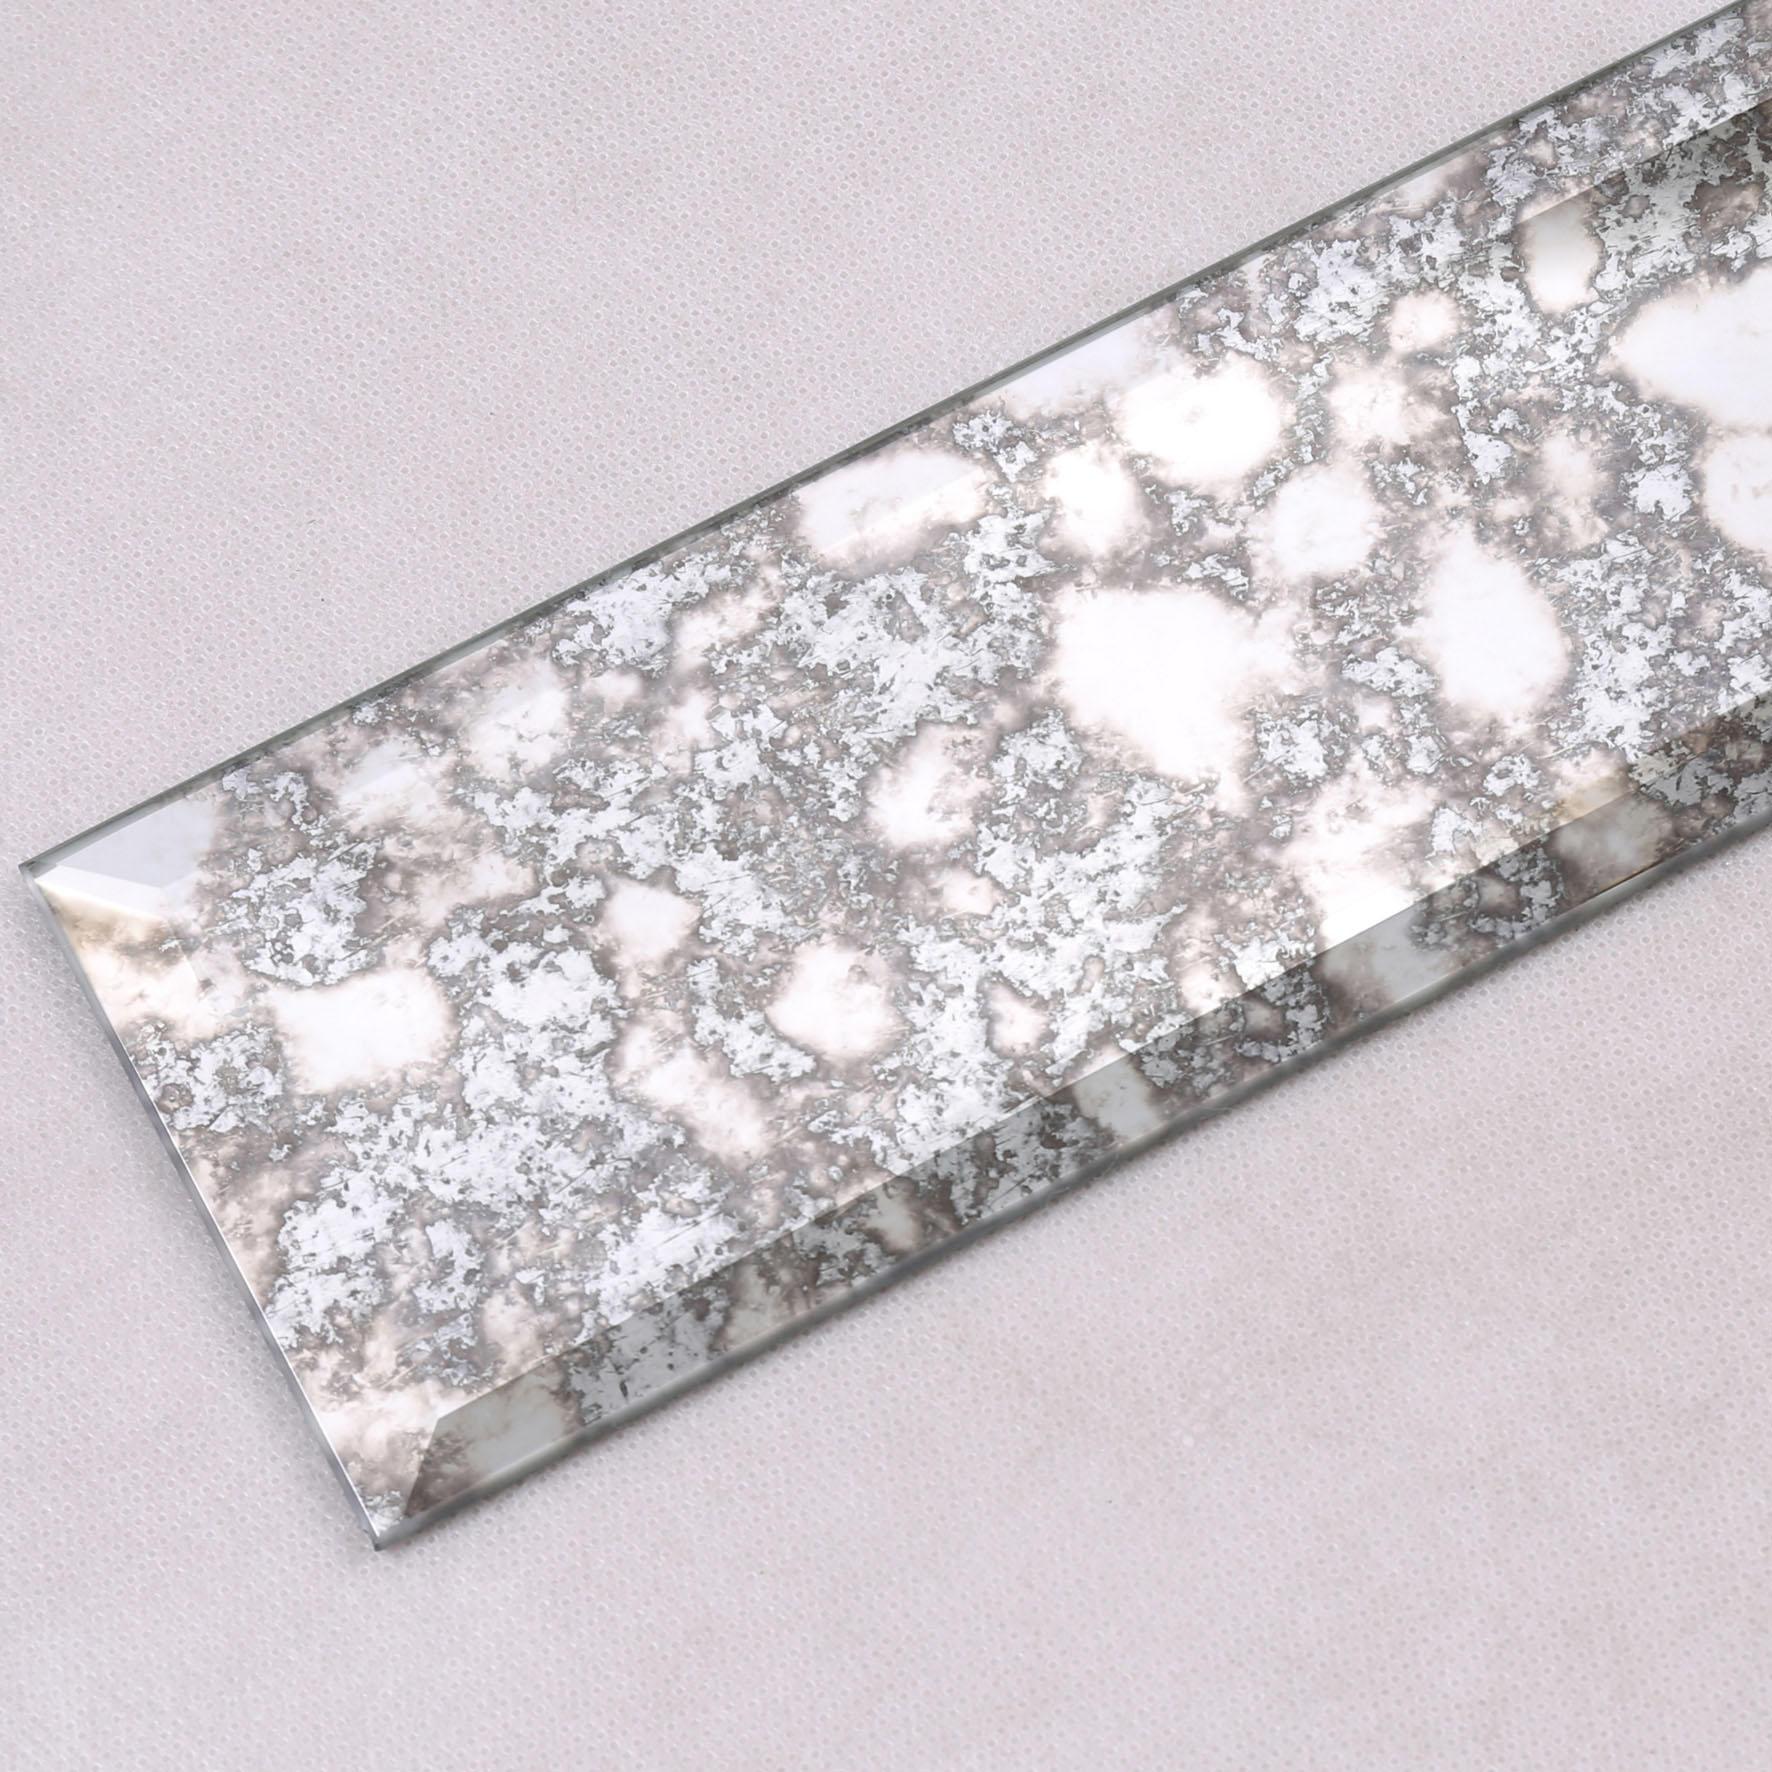 Heng Xing-Antique Mirror Grey Beveled Glass Mosaic Tile-2